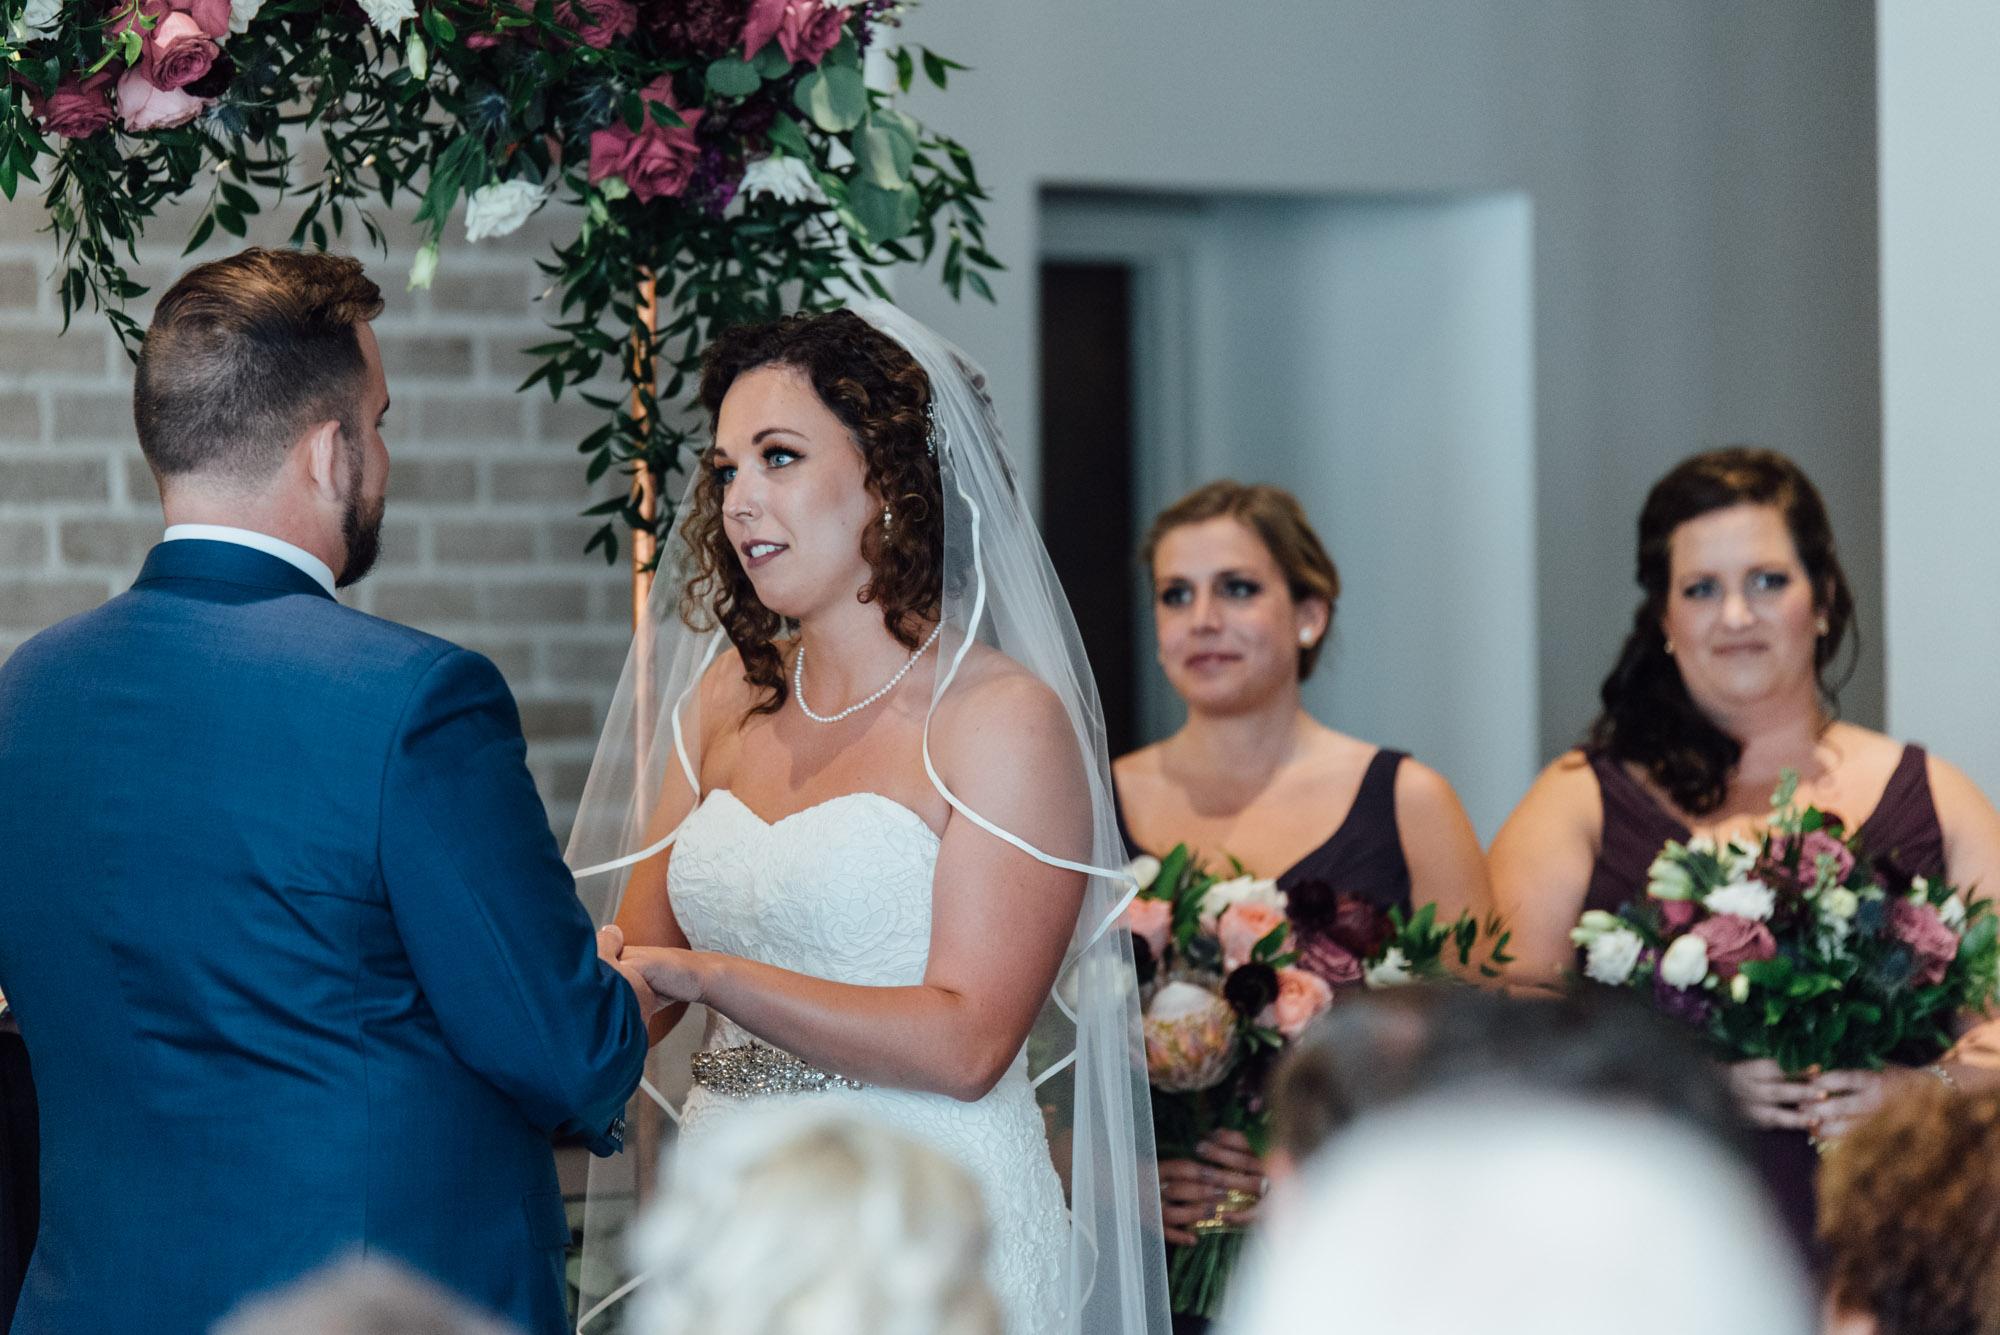 five-event-center-wedding-photographe-15.jpg